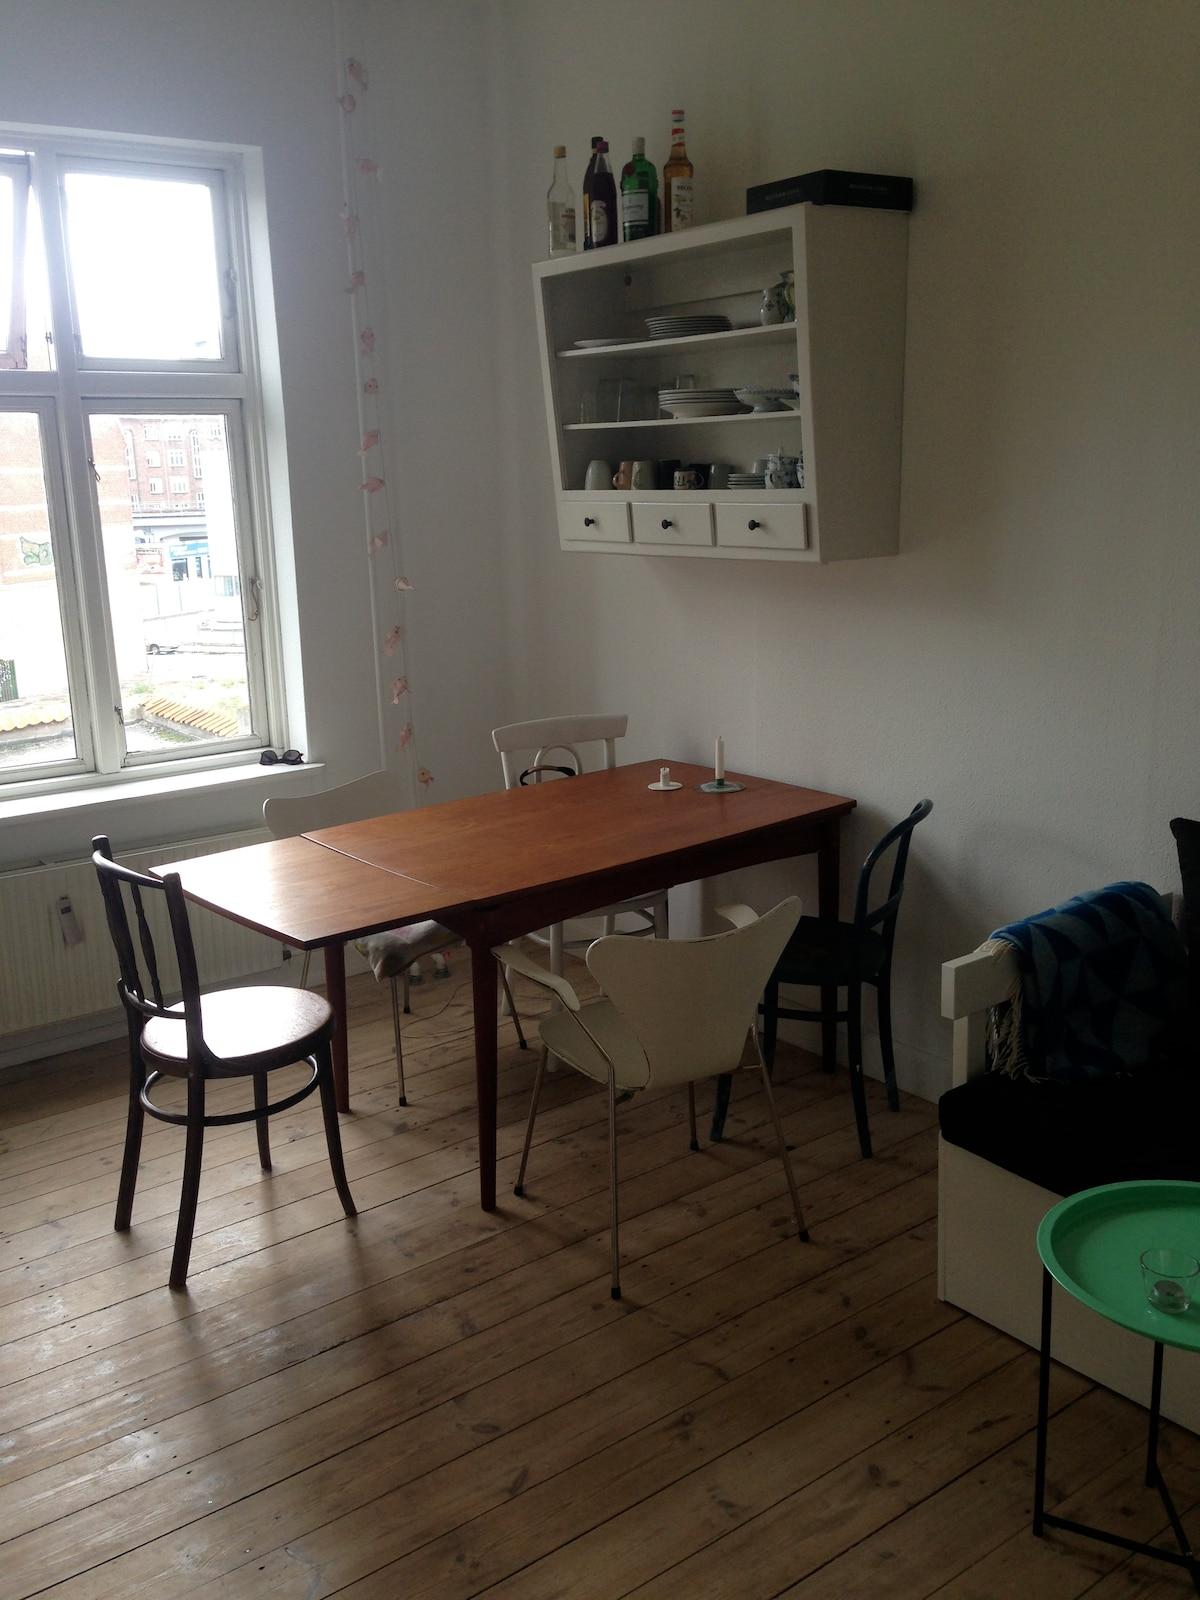 Nice apartment in Copenhagen